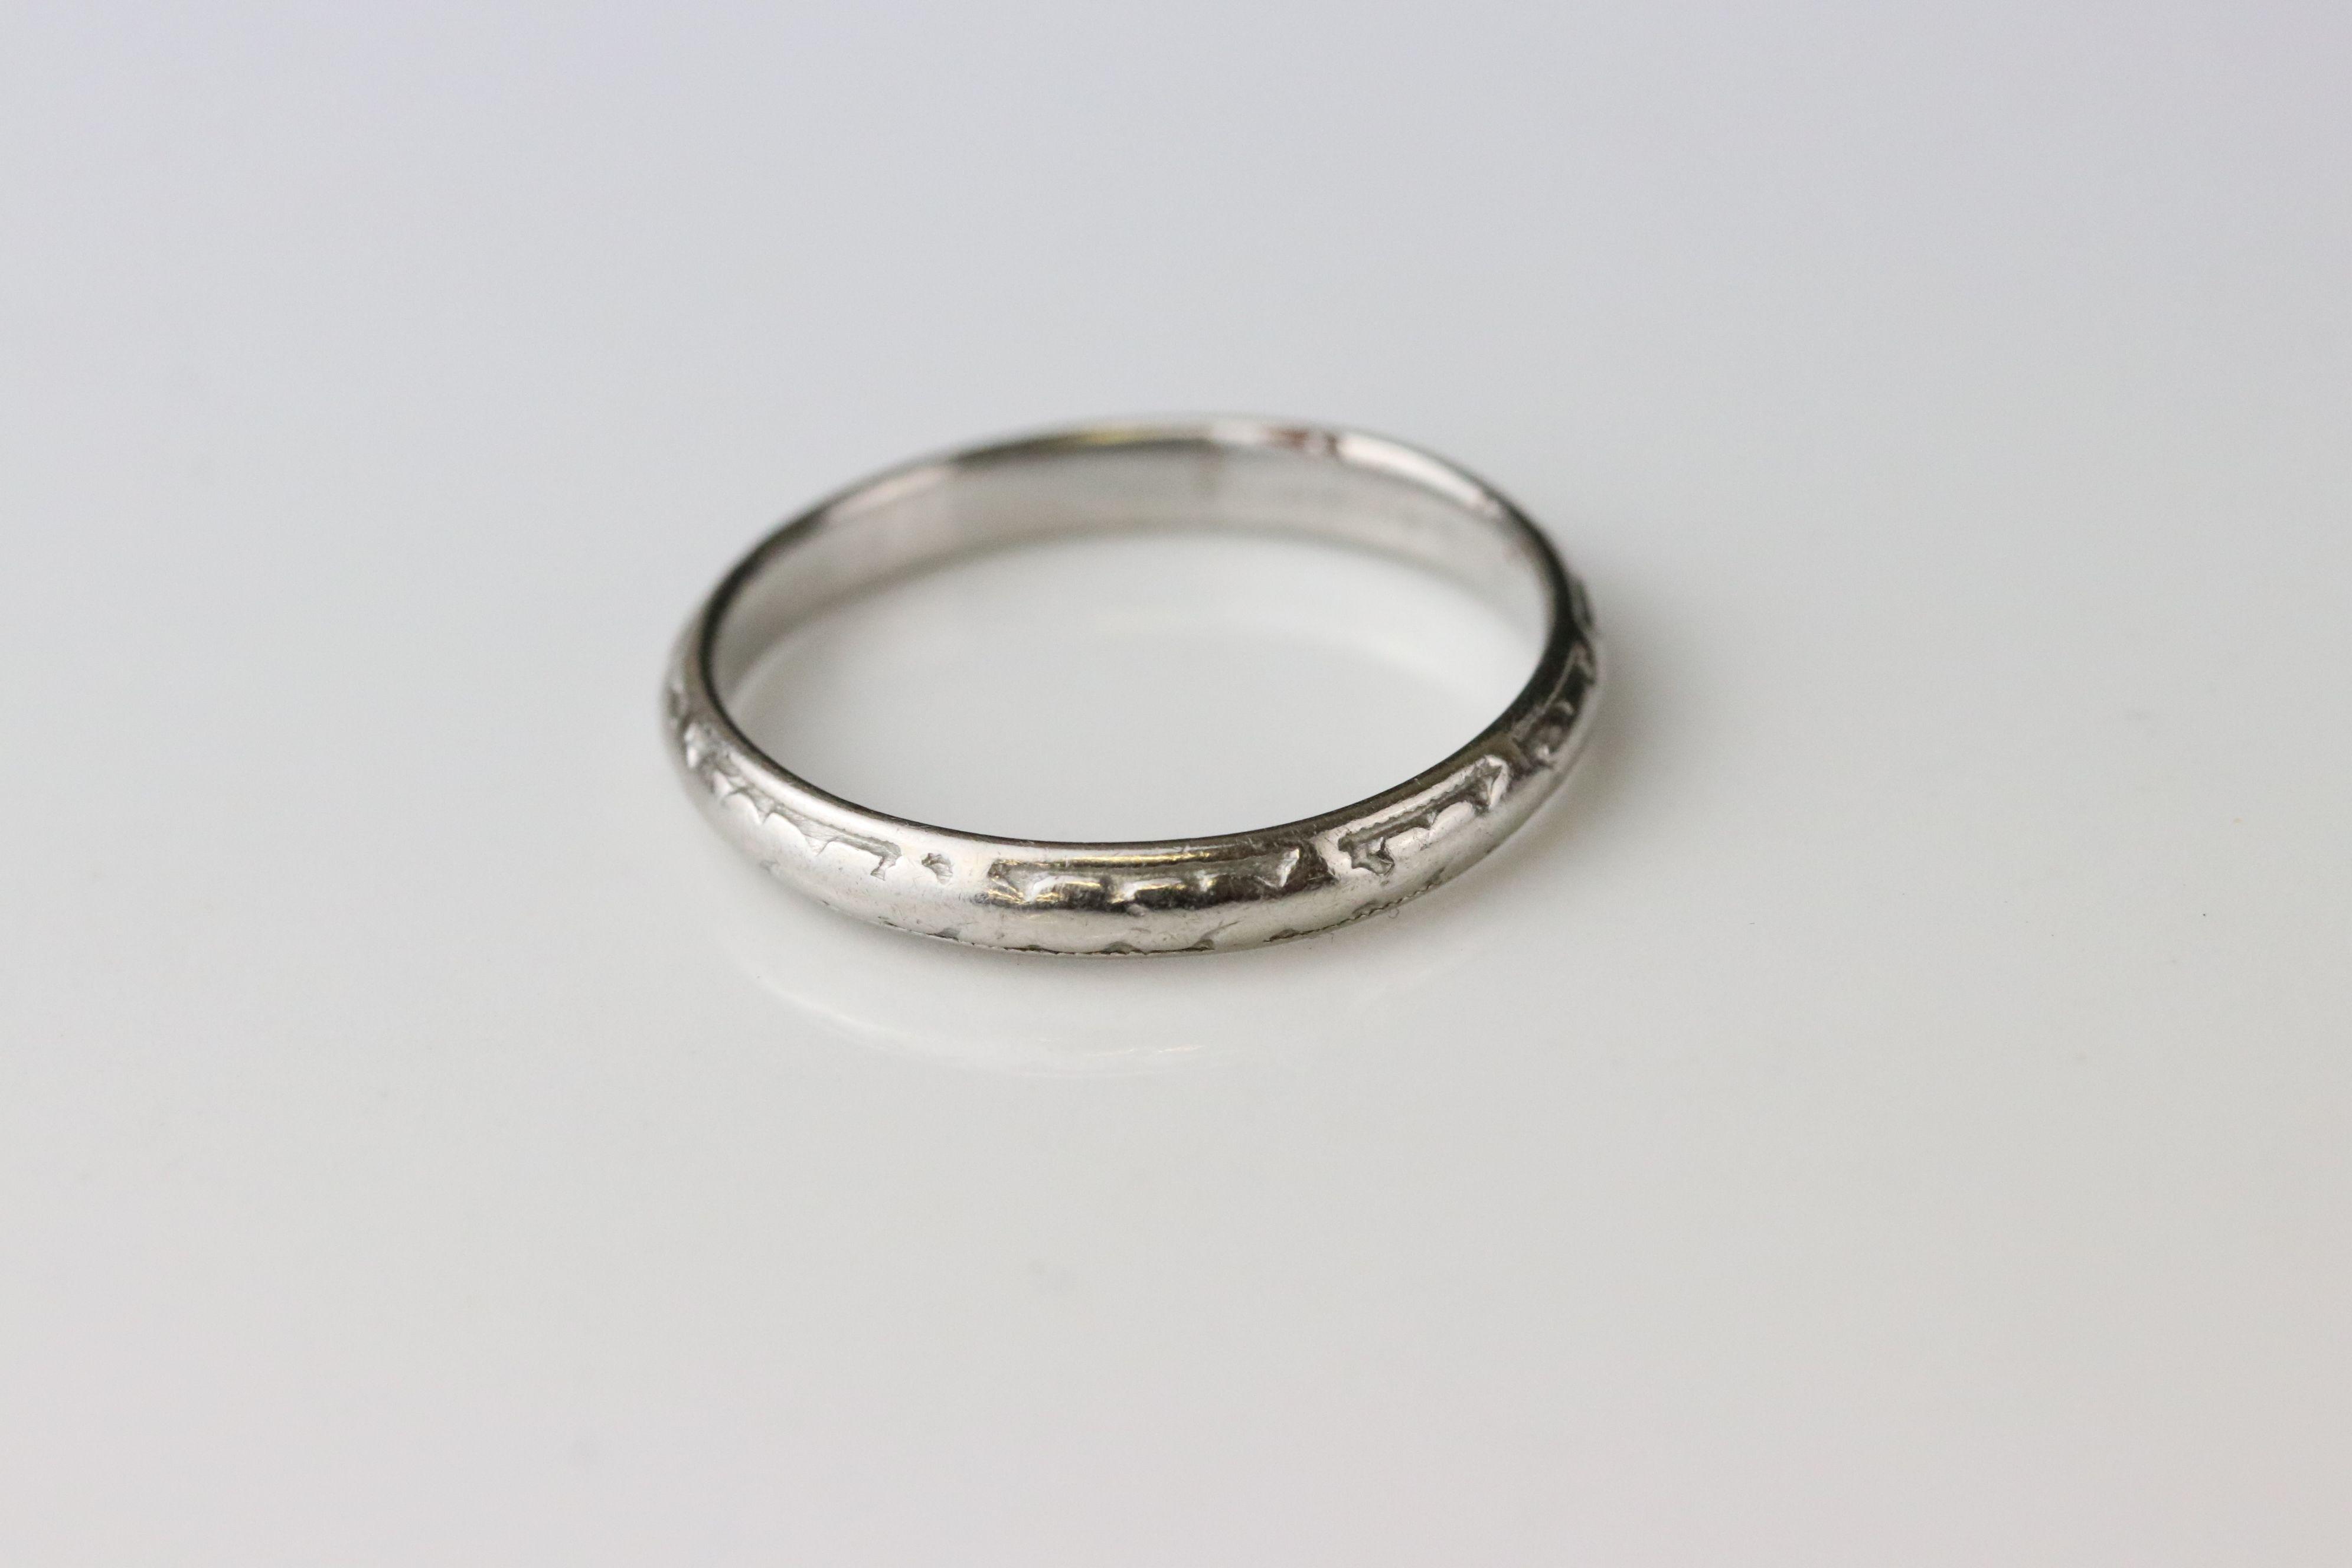 Platinum wedding band, worn foliate design, width approx 2.5mm, ring size M